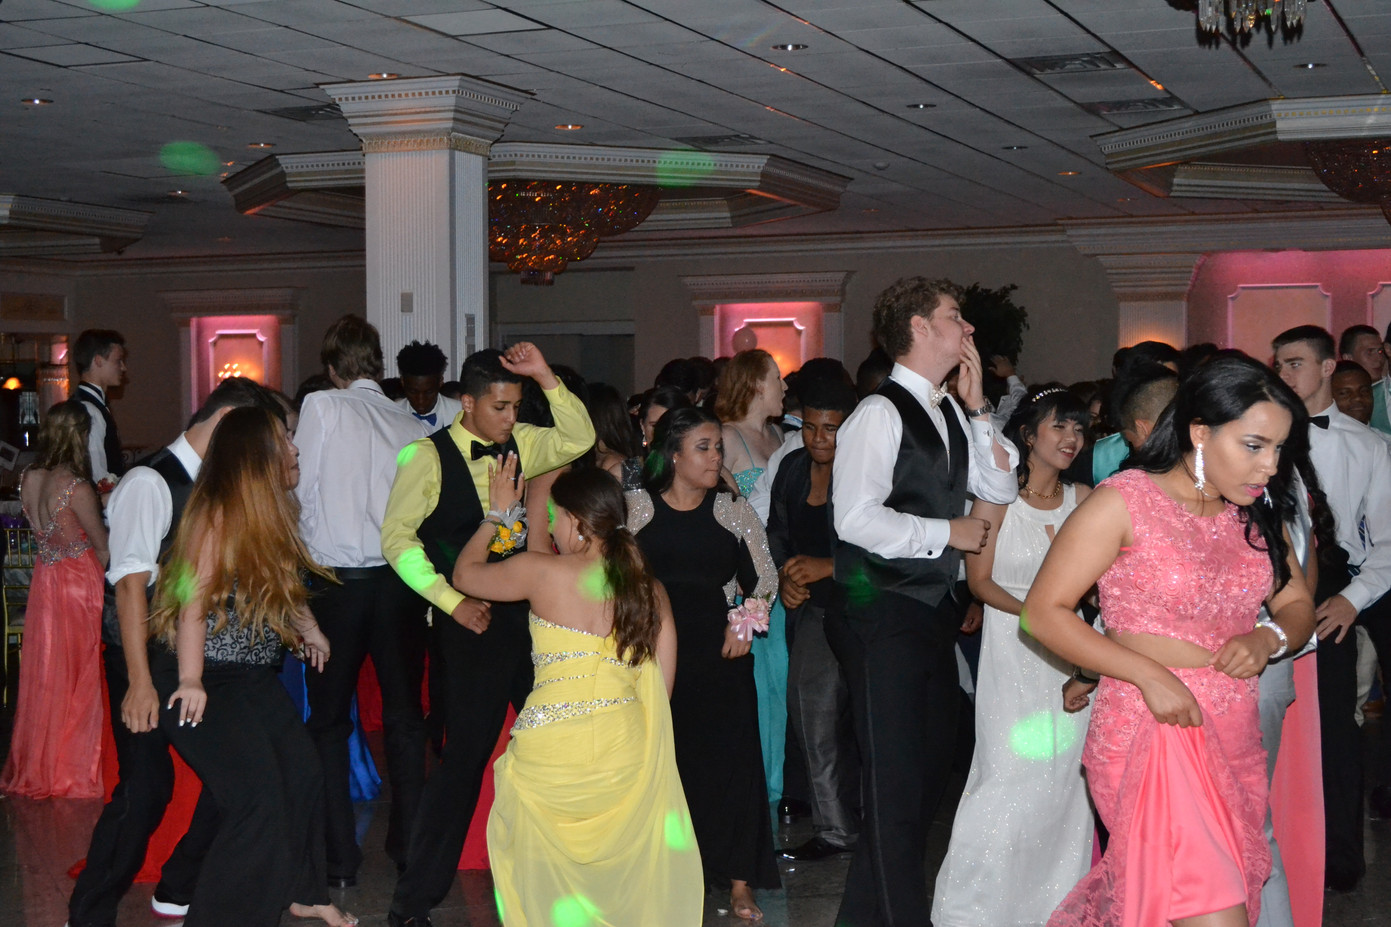 Group-Prom-Dance.JPG